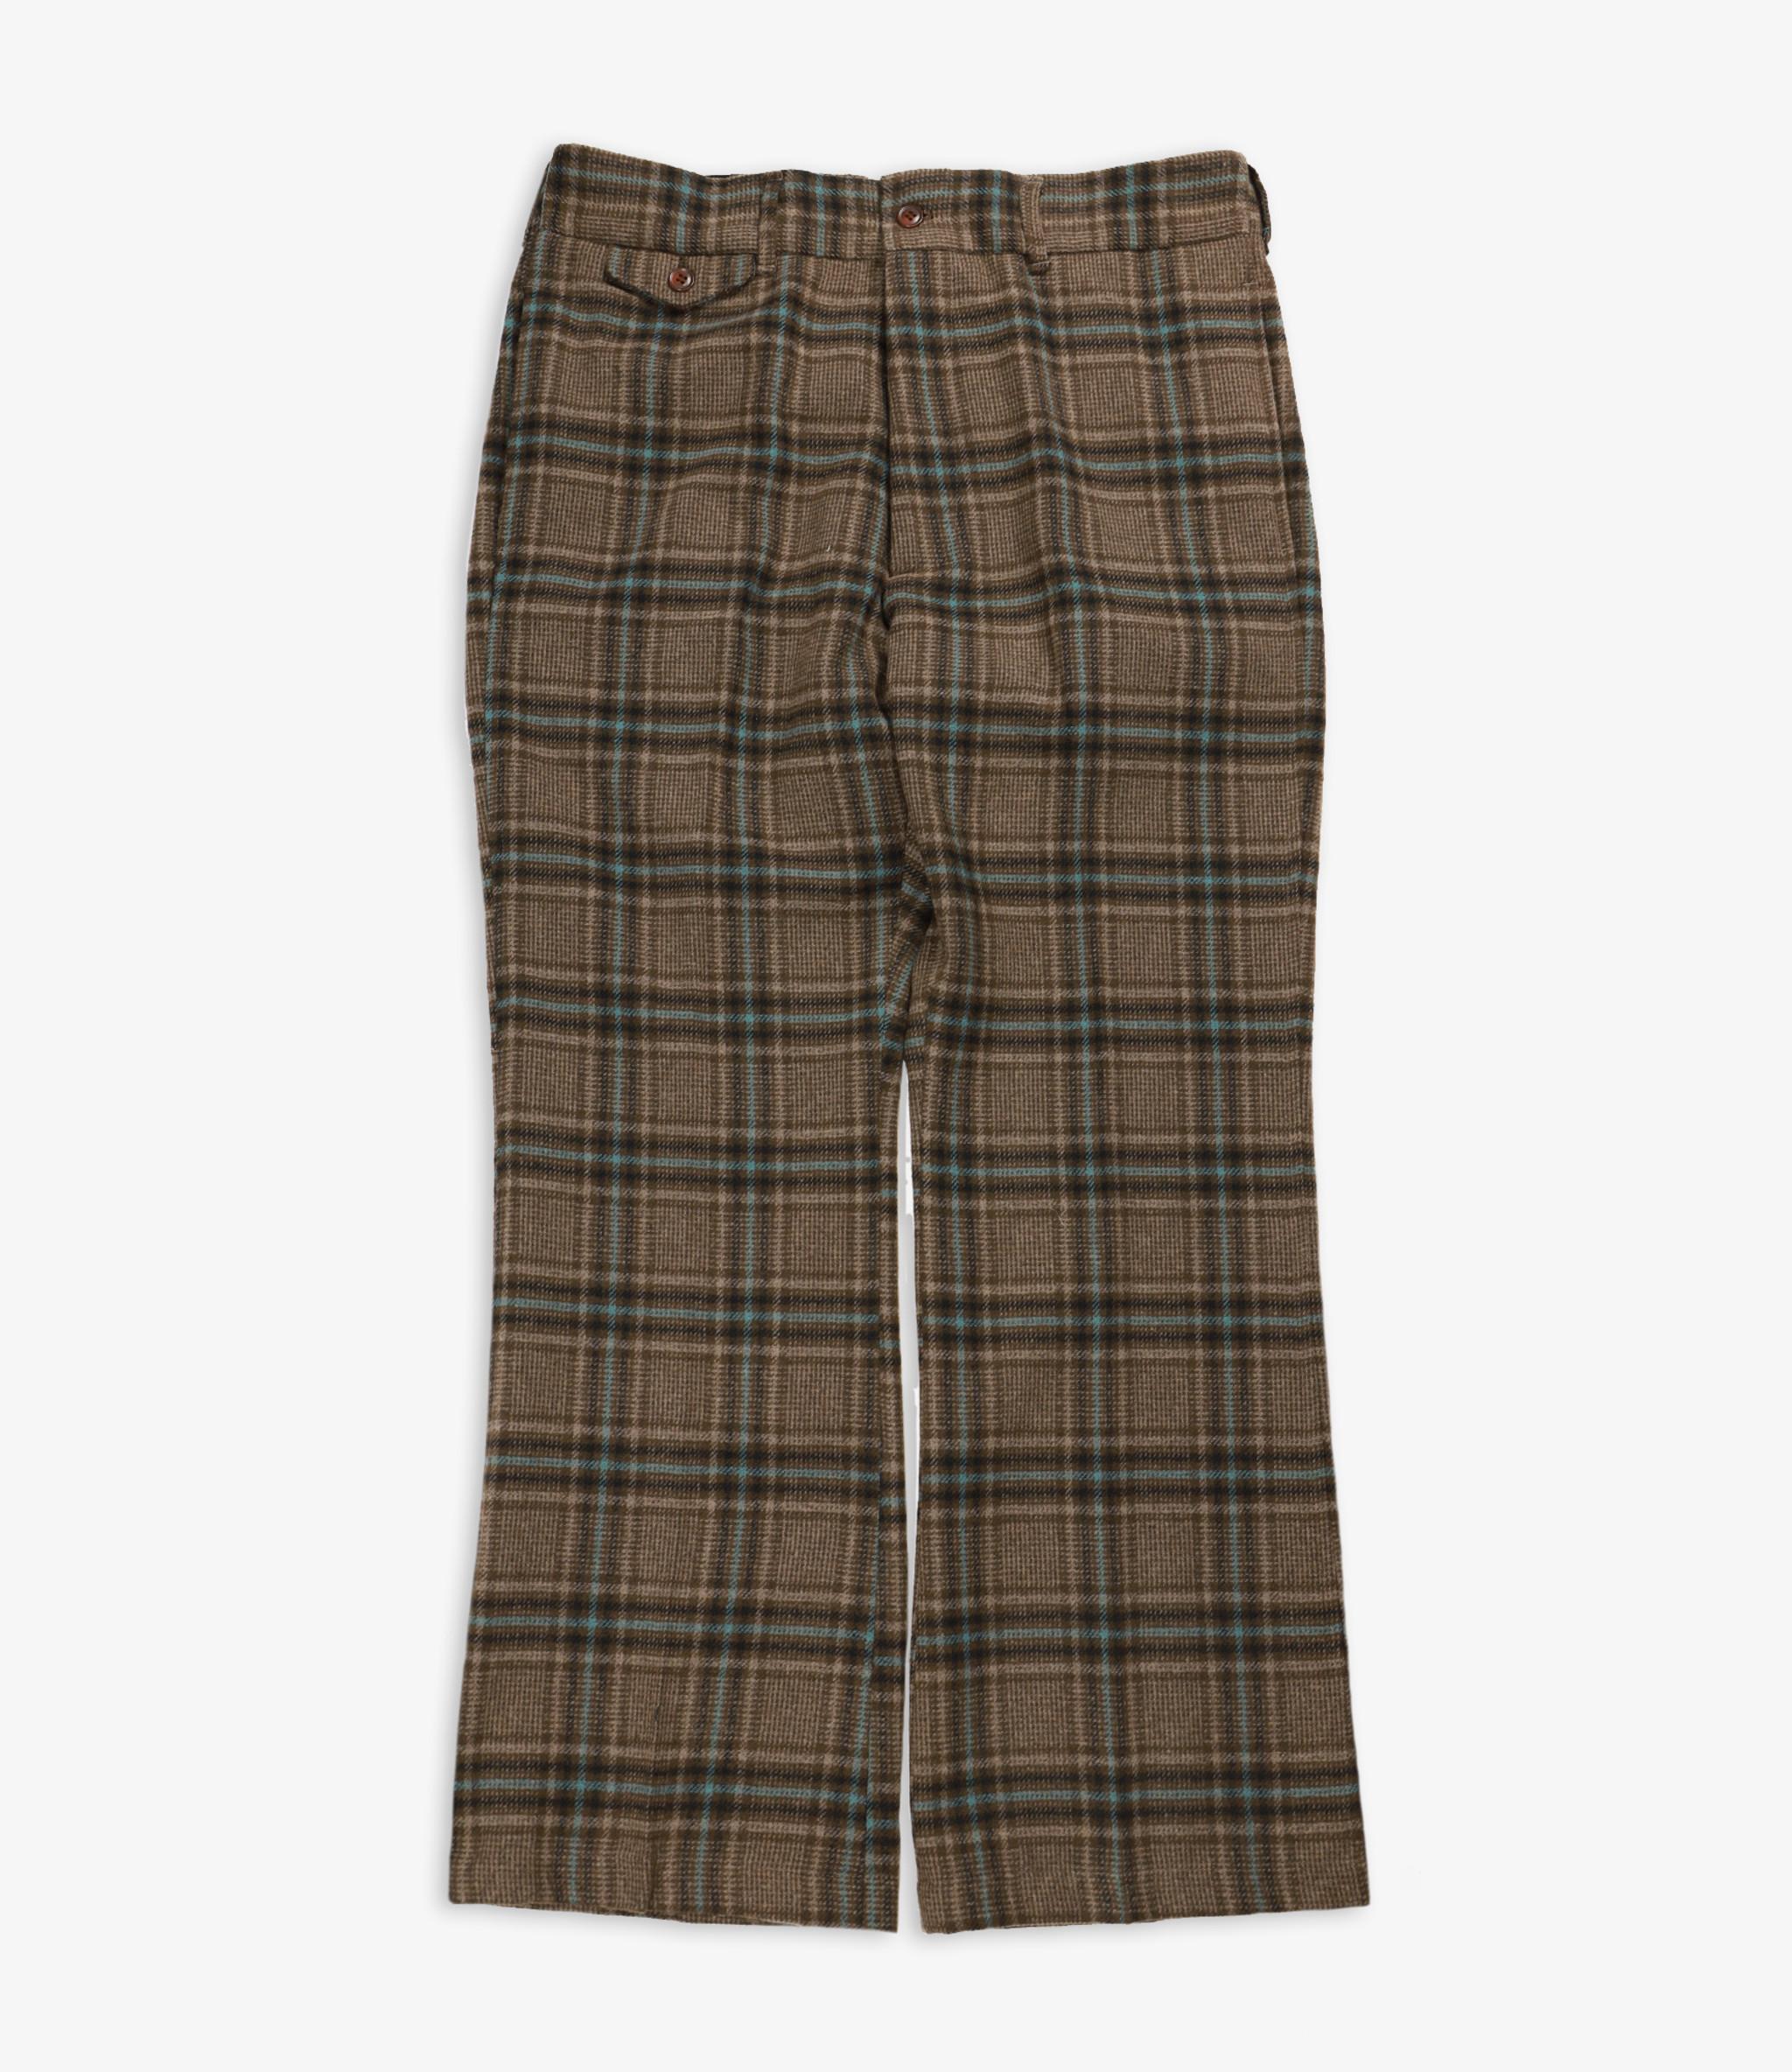 Needles F.P. Boot-Cut Trouser - Plaid Tweed - Brown